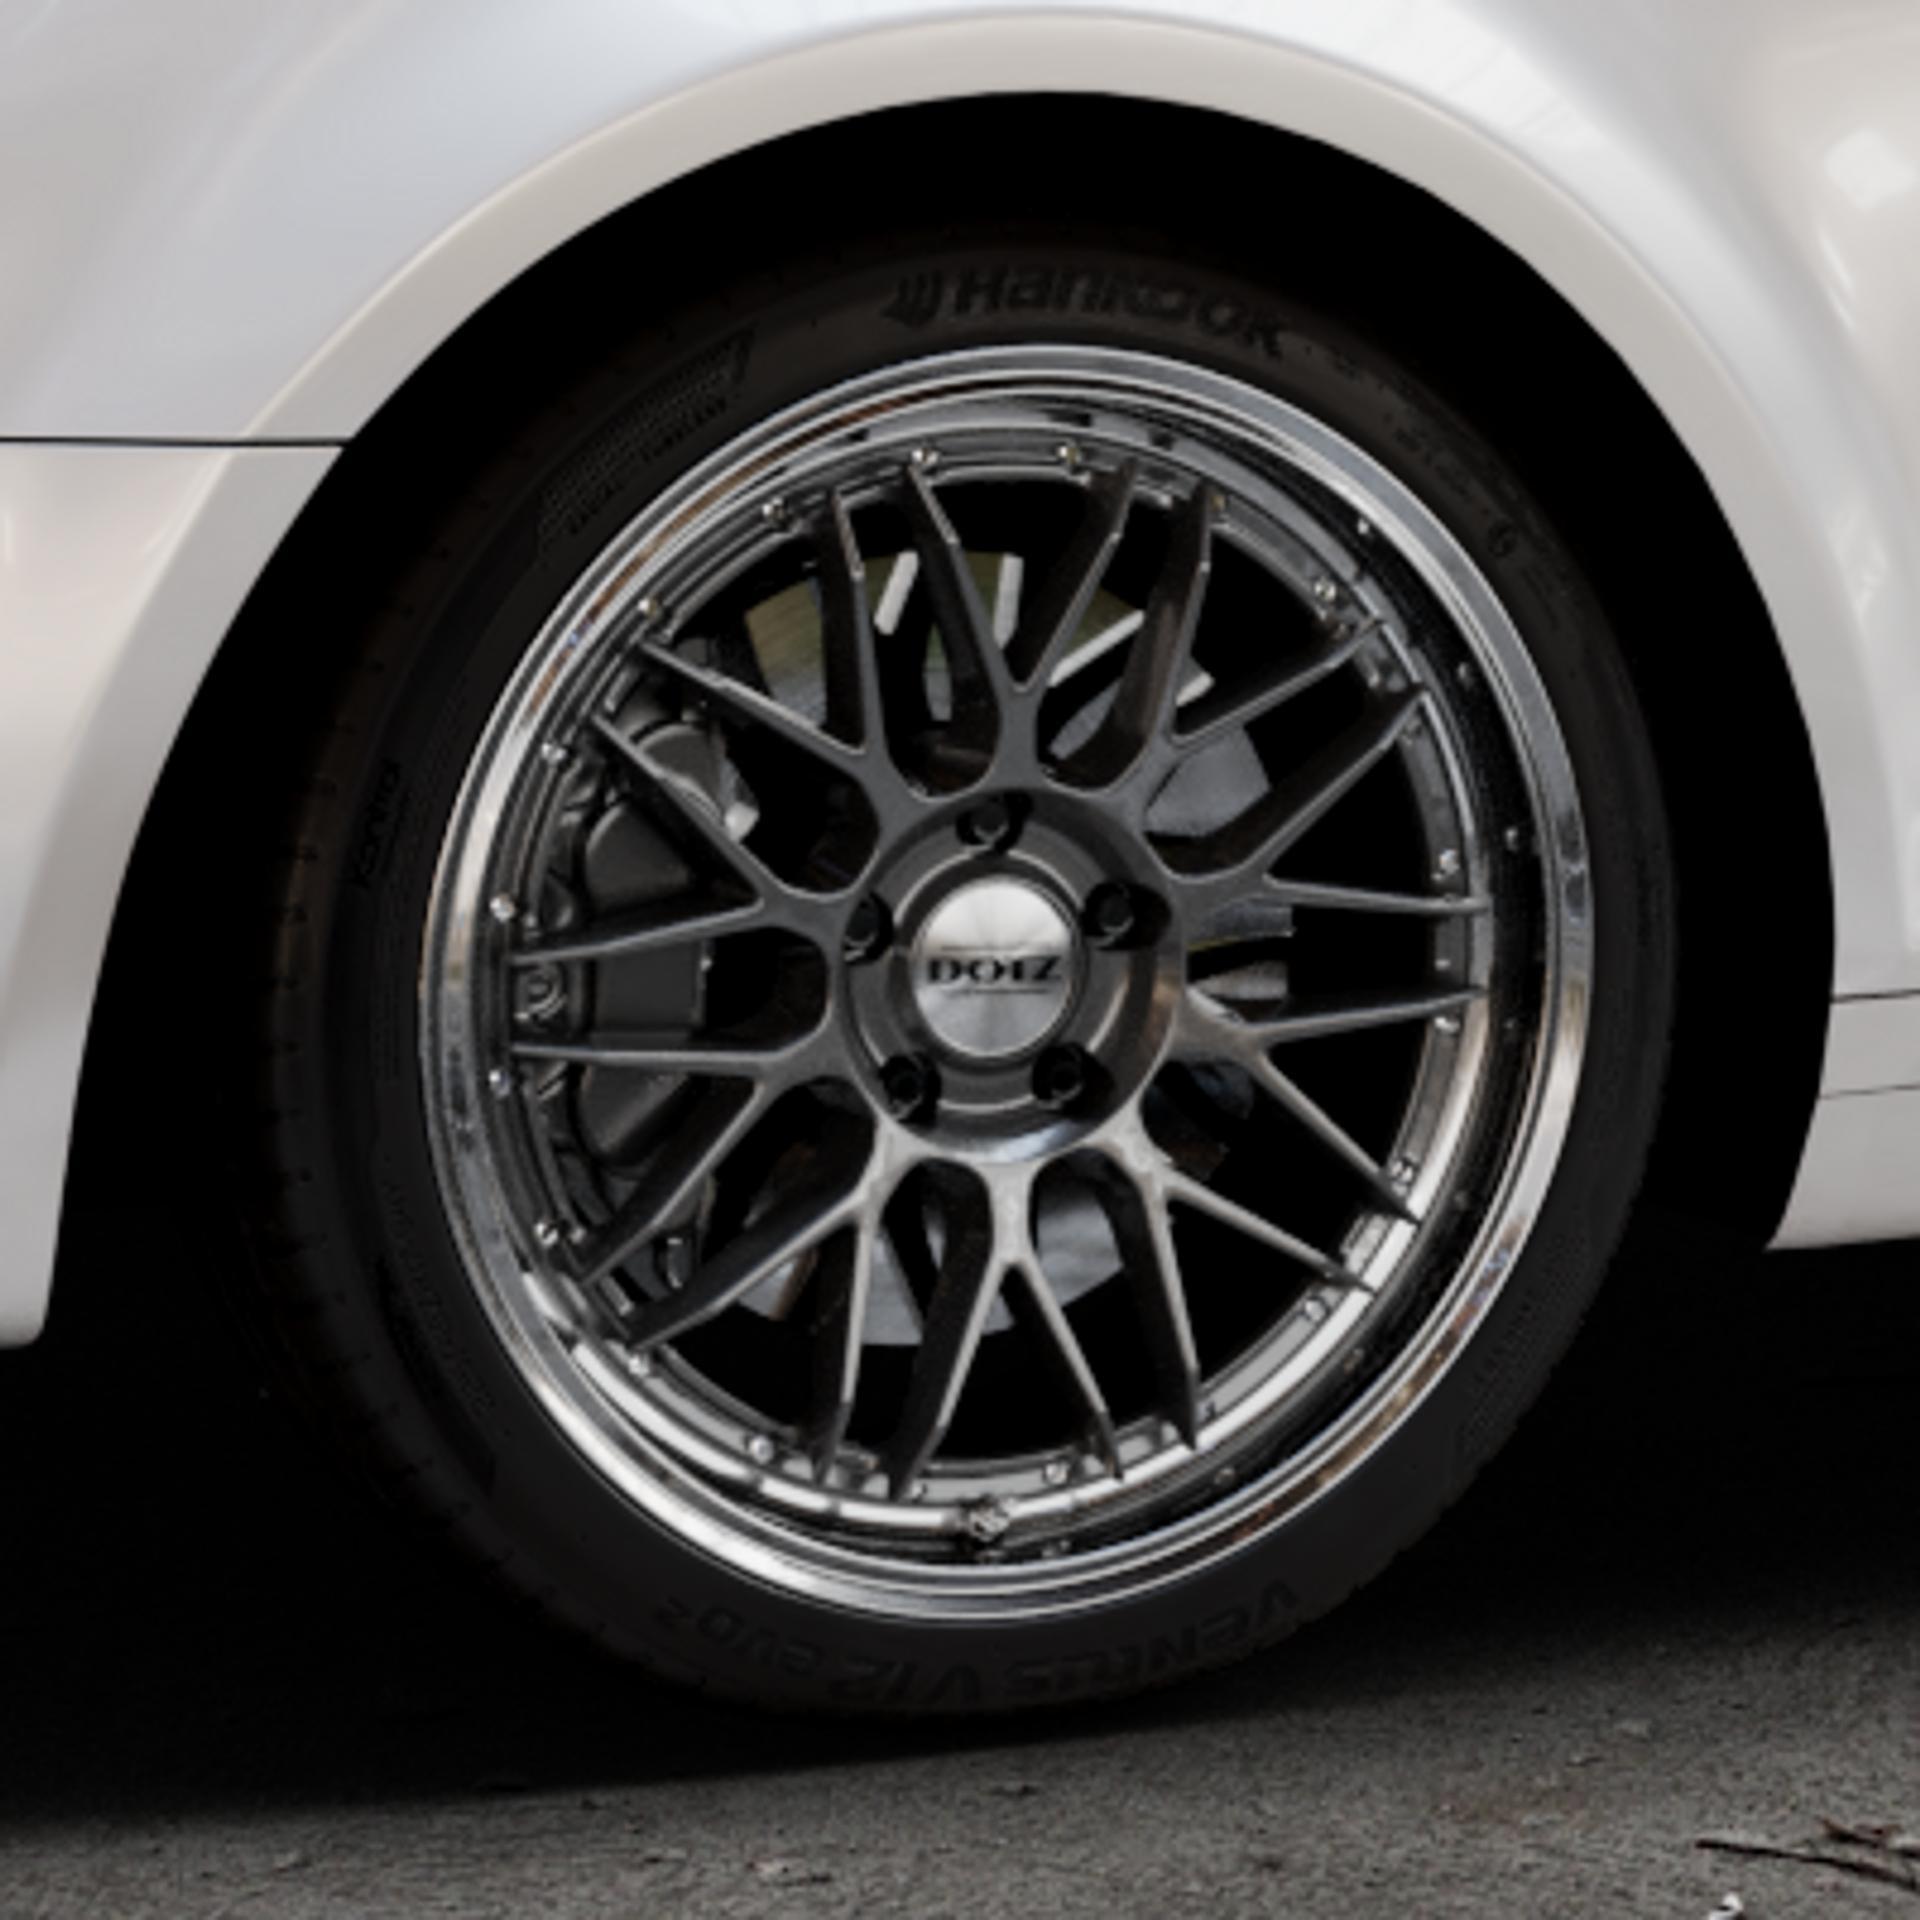 DOTZ REVVO GUNMETAL POLISHED Felge mit Reifen grau silber mehrfarbig in 18Zoll Alufelge auf weissem Audi A3 Typ 8P (Sportback) 1,6l 75kW (102 PS) 2,0l FSI 110kW (150 1,9l TDI 77kW (105 103kW (140 TFSI 147kW (200 85kW (116 100kW (136 1,8l 118kW (160 125kW (170 1,4l 92kW (125 120kW (163 quattro 3,2l V6 184kW (250 S3 195kW (265 1,2l 66kW (90 18